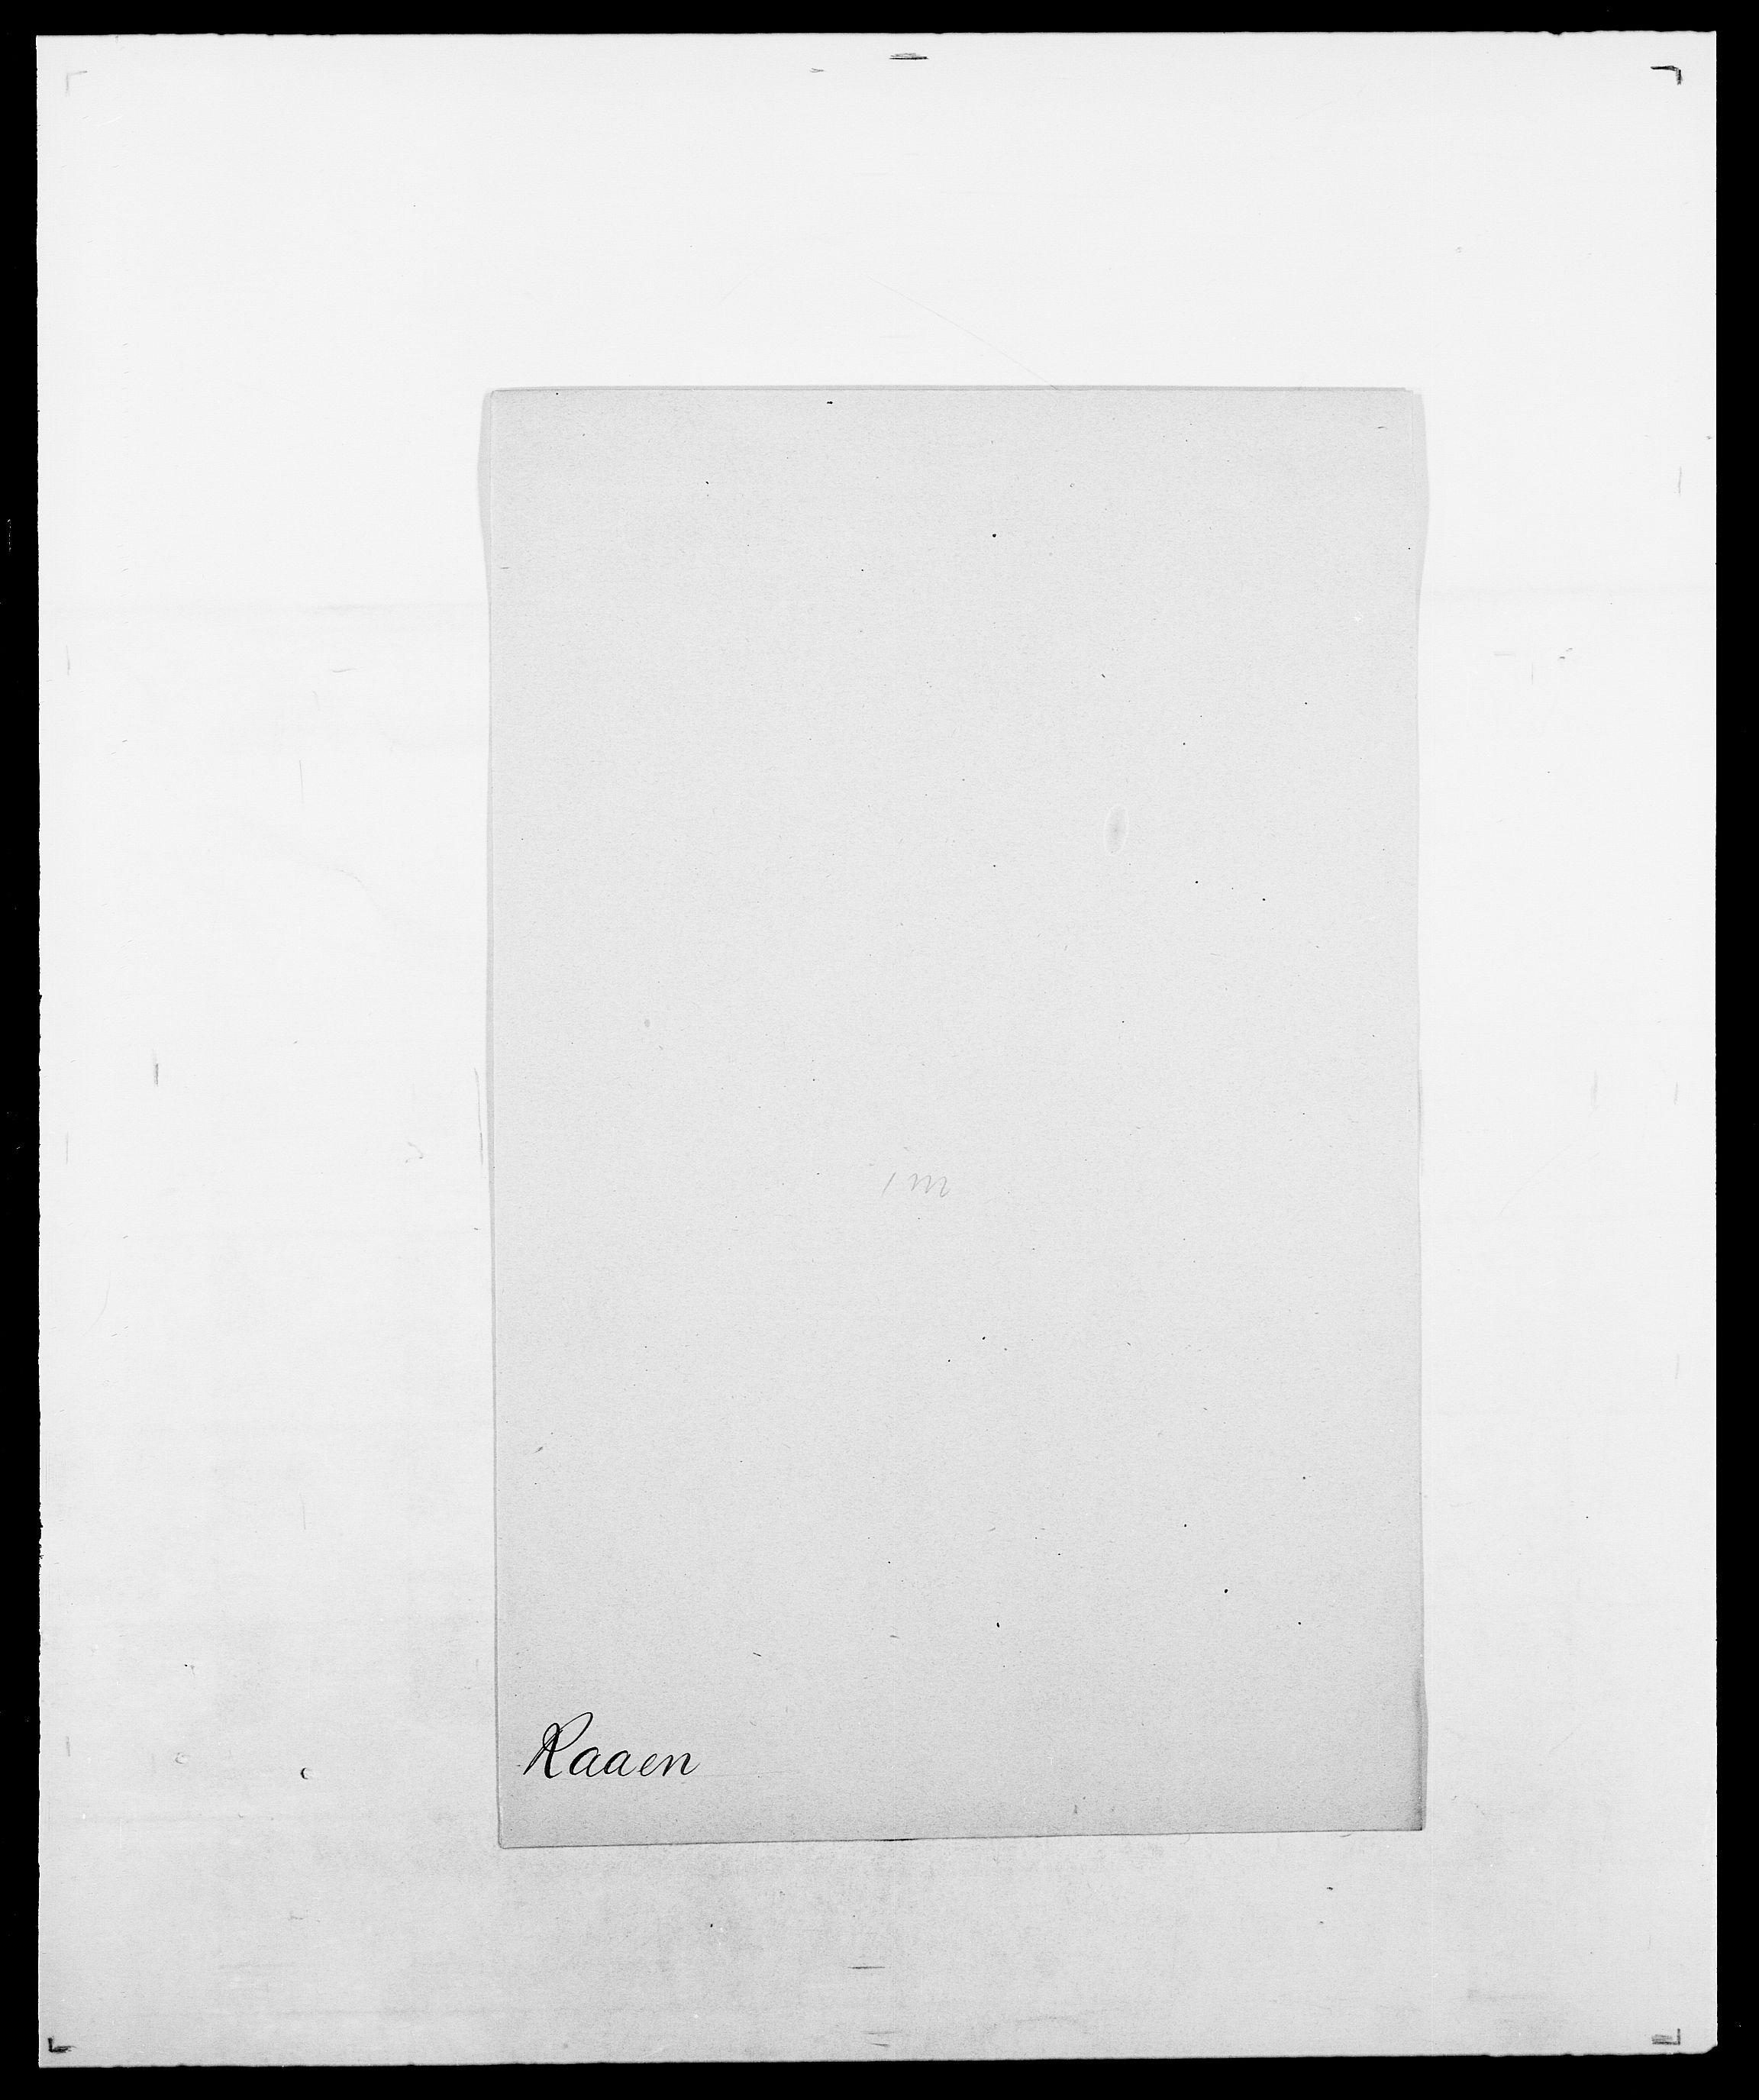 SAO, Delgobe, Charles Antoine - samling, D/Da/L0031: de Place - Raaum, s. 532